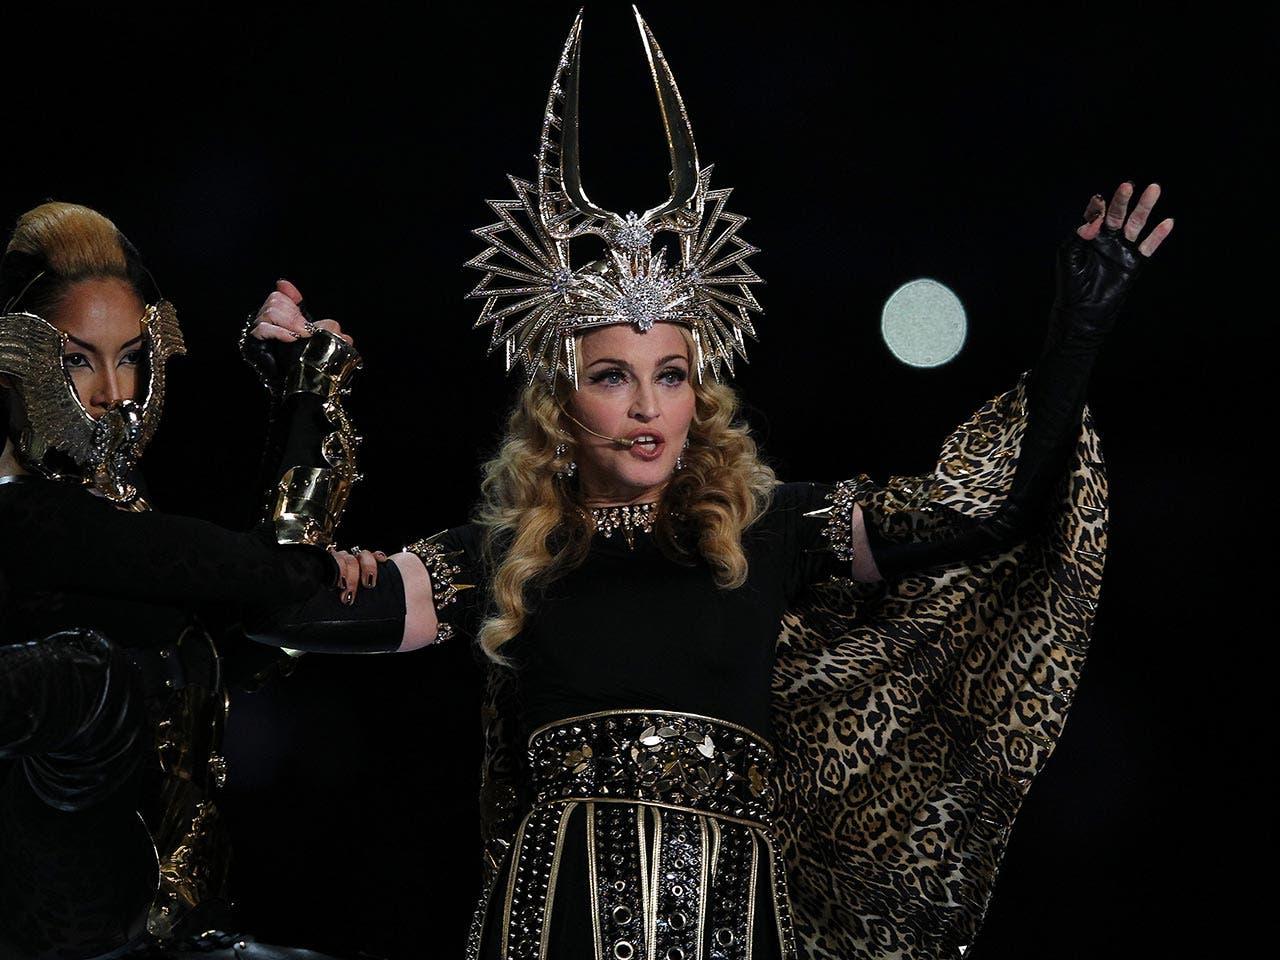 Madonna | Al Bello/Getty Images